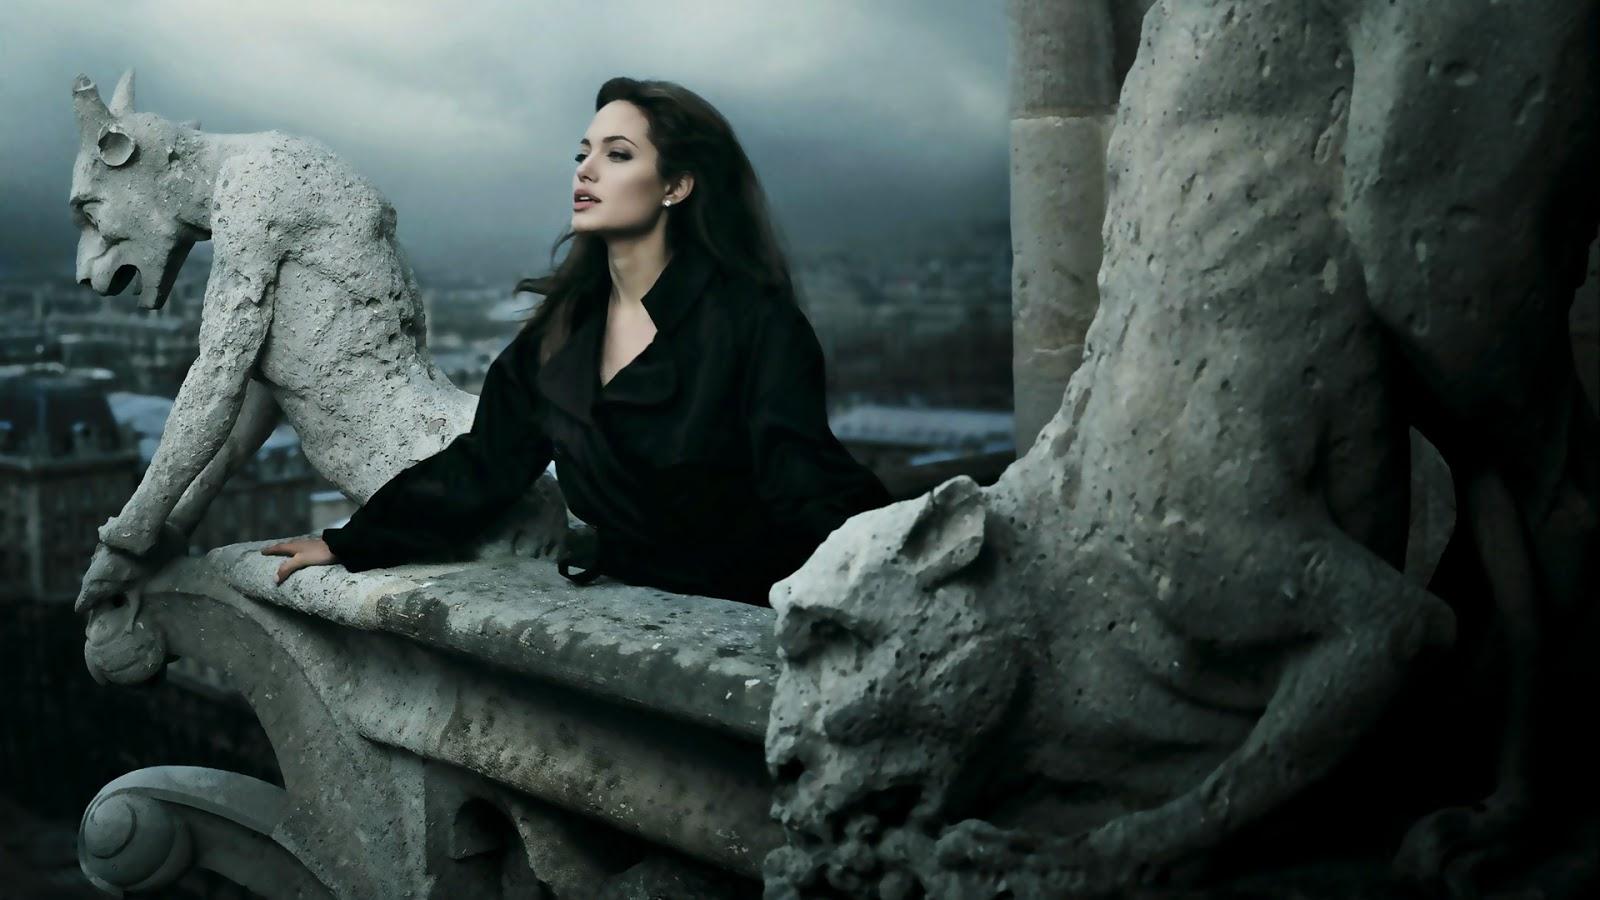 film stars world: angelina jolie hot wallpapers 2014